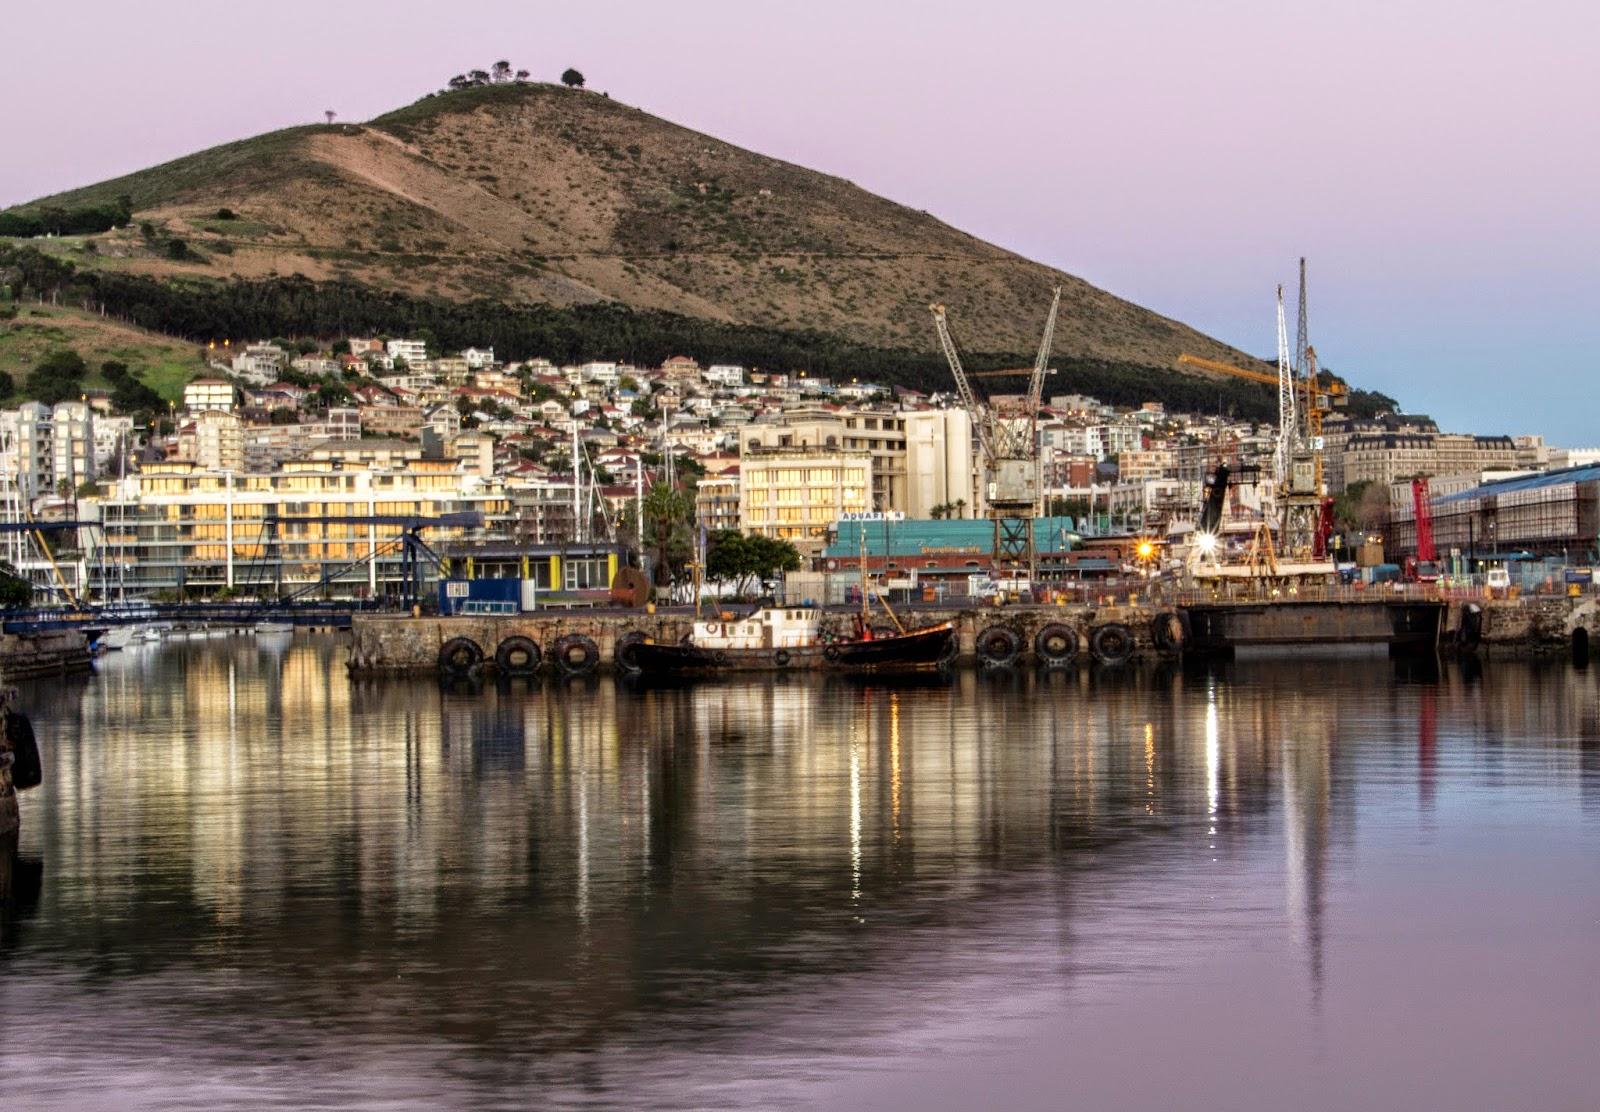 Sunrise V&A Waterfront Cape Town - Canon EOS 700D DSLR Camera